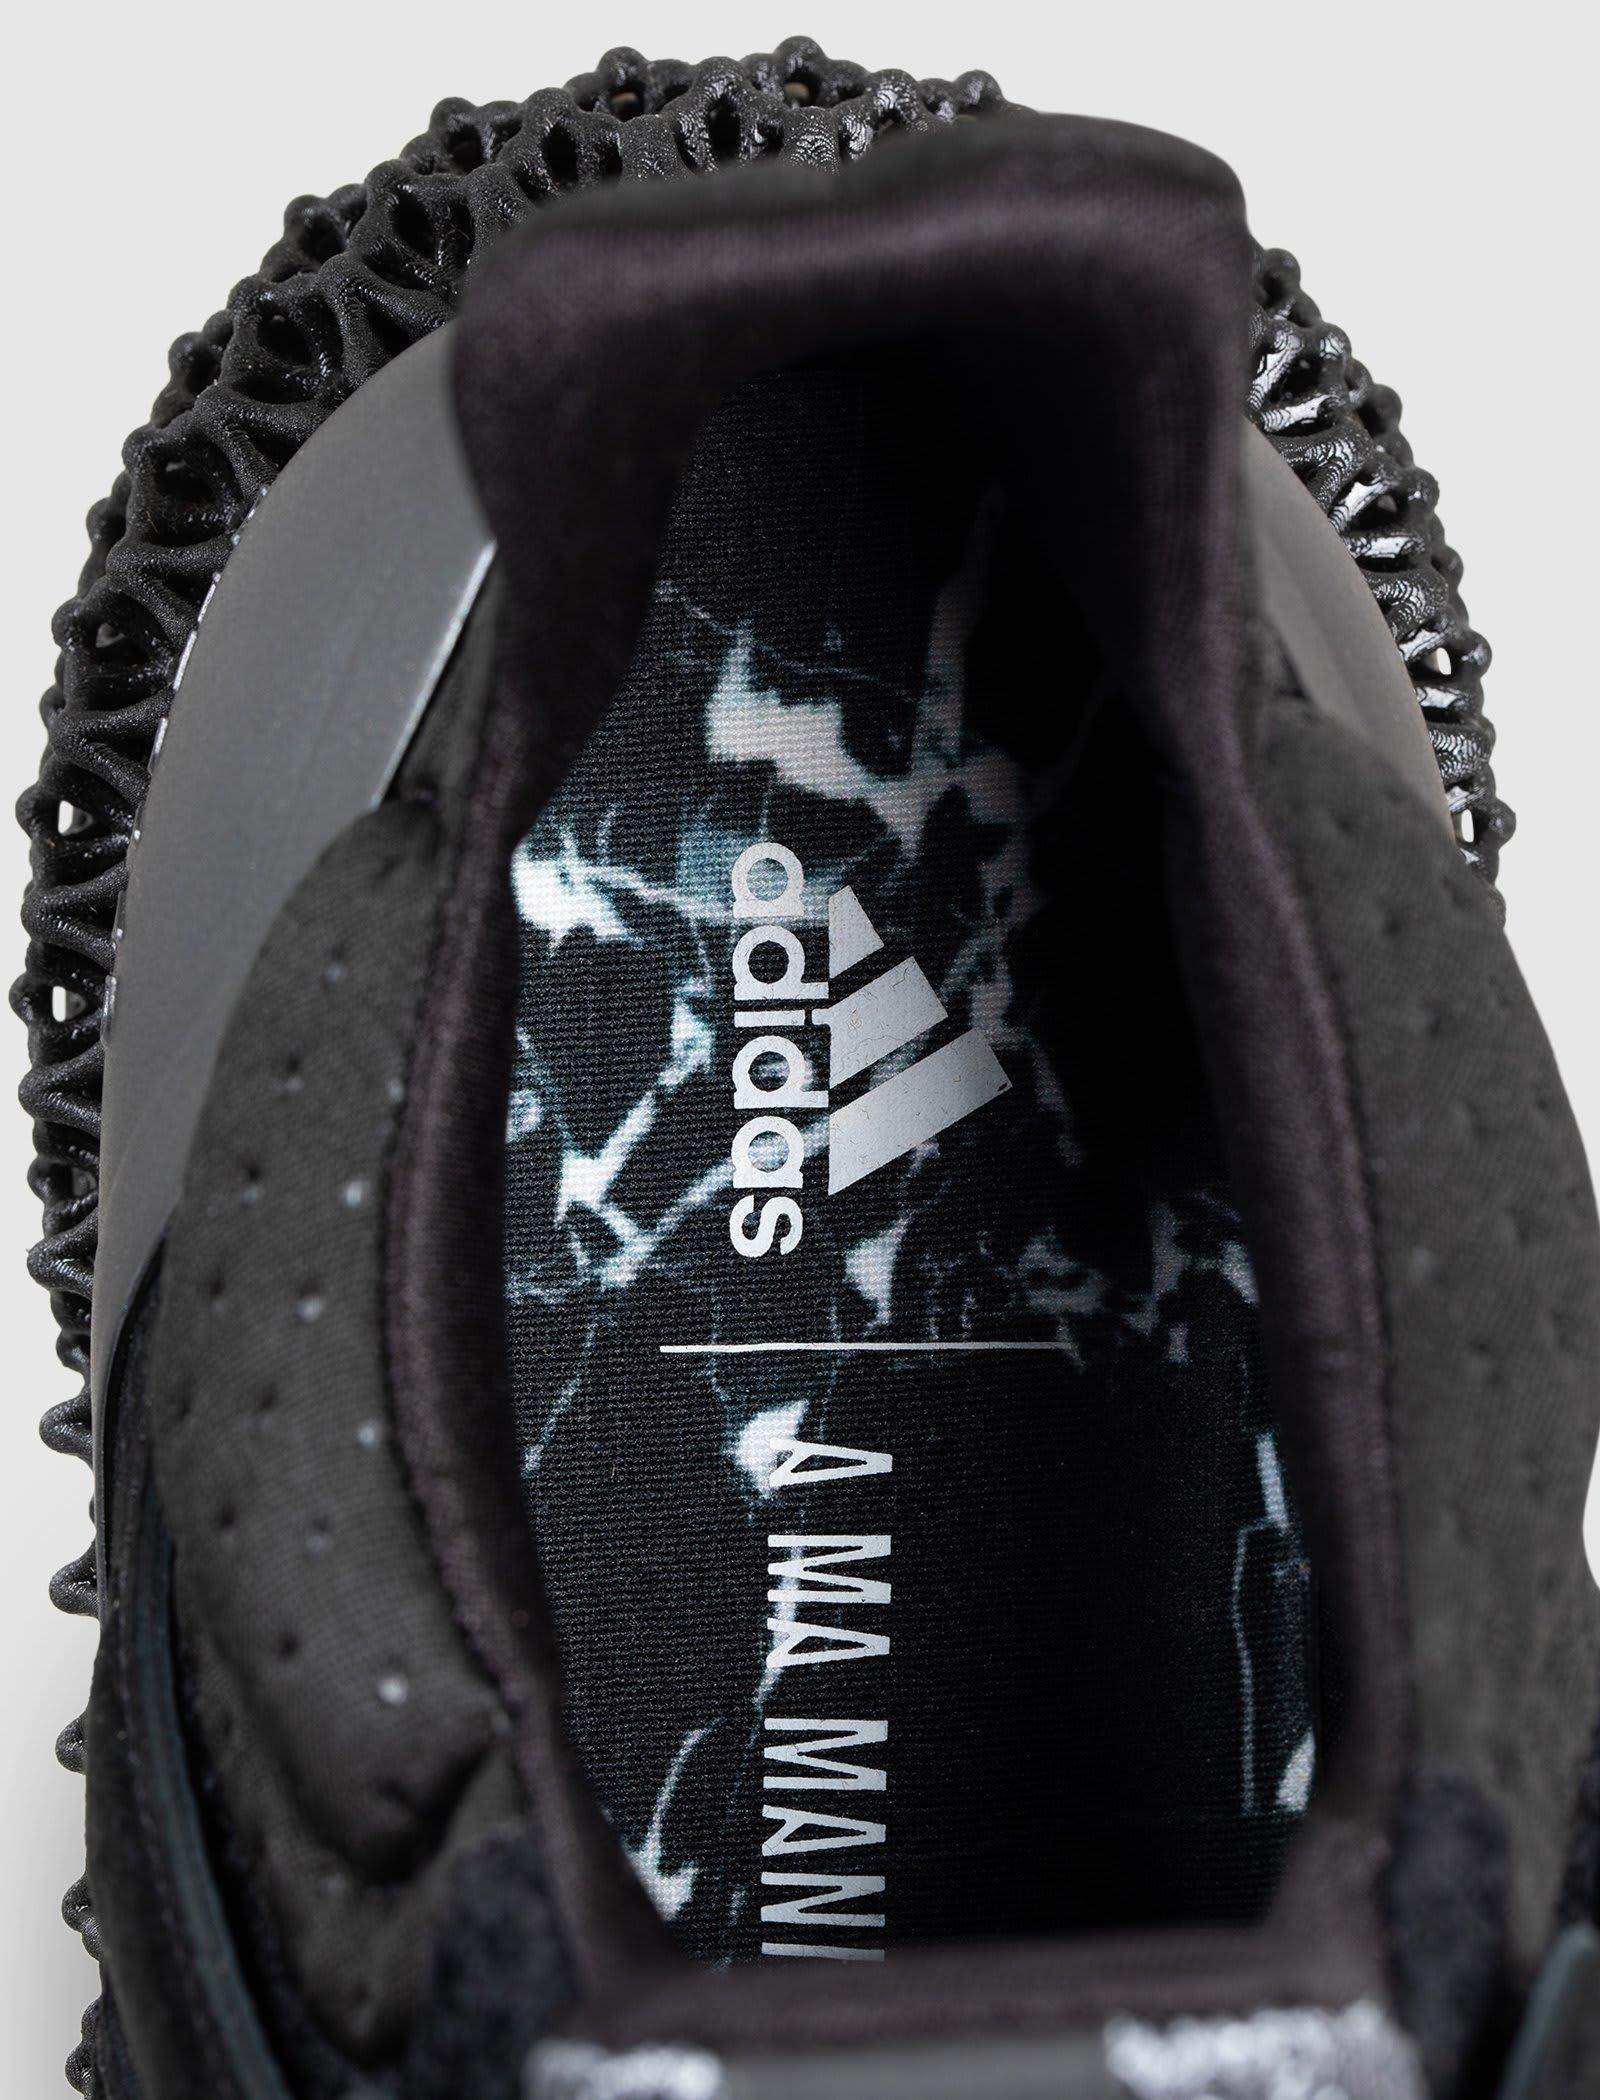 A Ma Maniere Adidas Ultra 4D G55274 Release Date Insoles